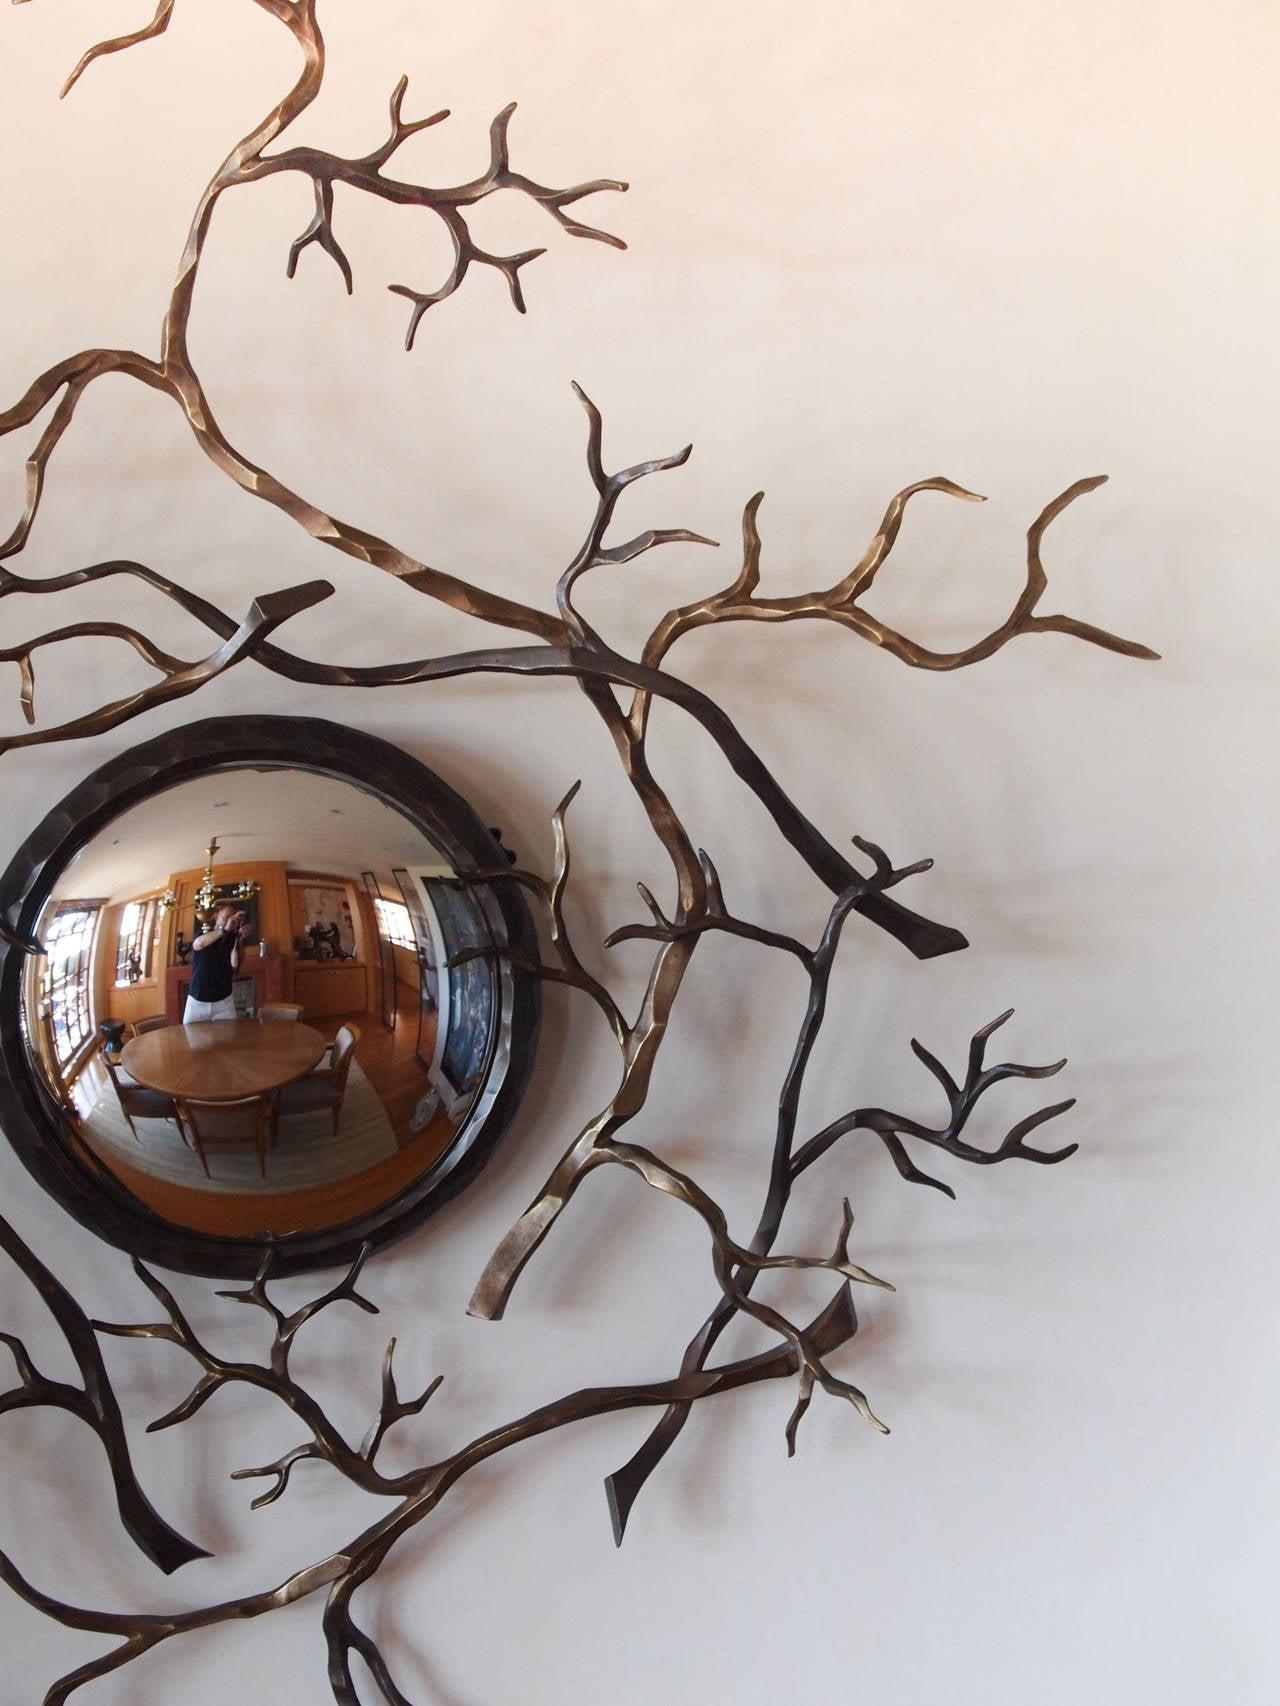 Bullseye mirror entitled